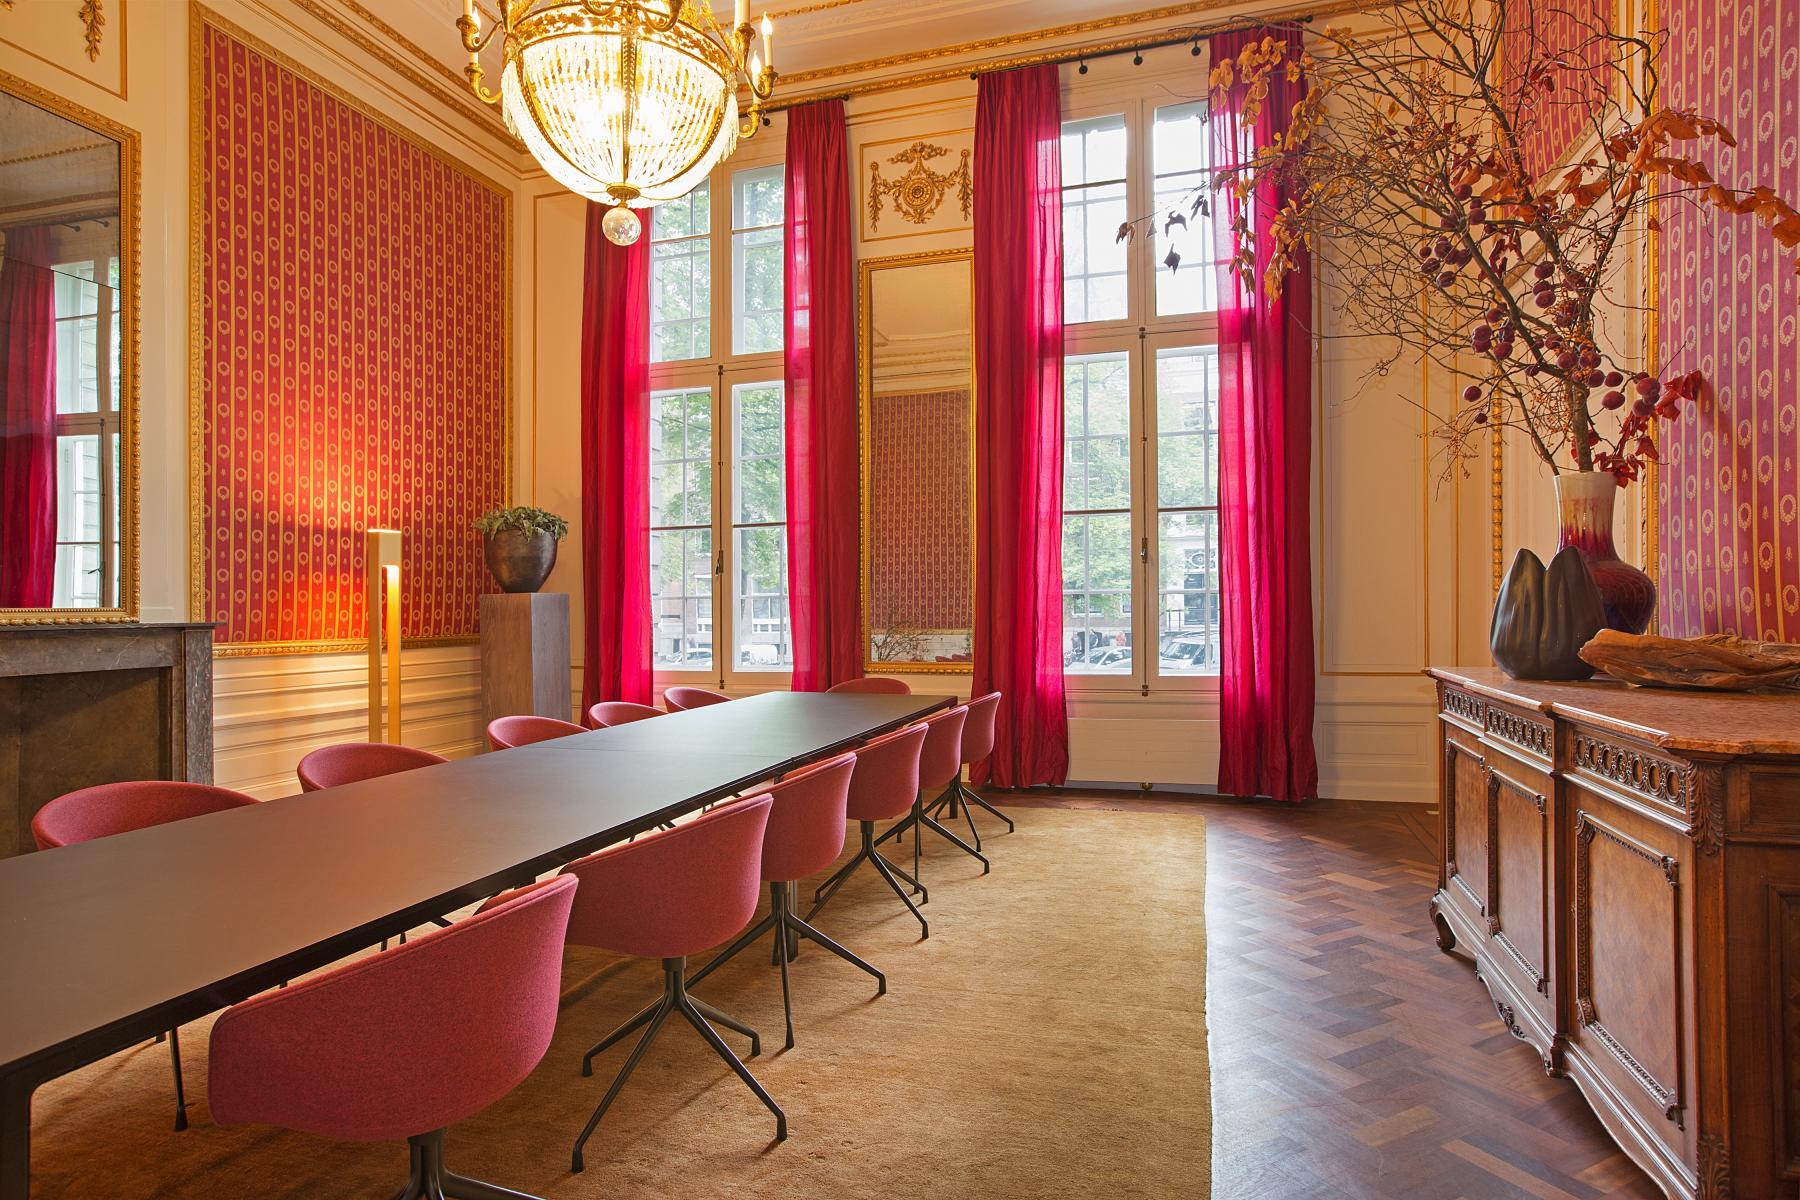 meubilair huren amsterdam tafel stoel kantoorruimte herengracht skepp